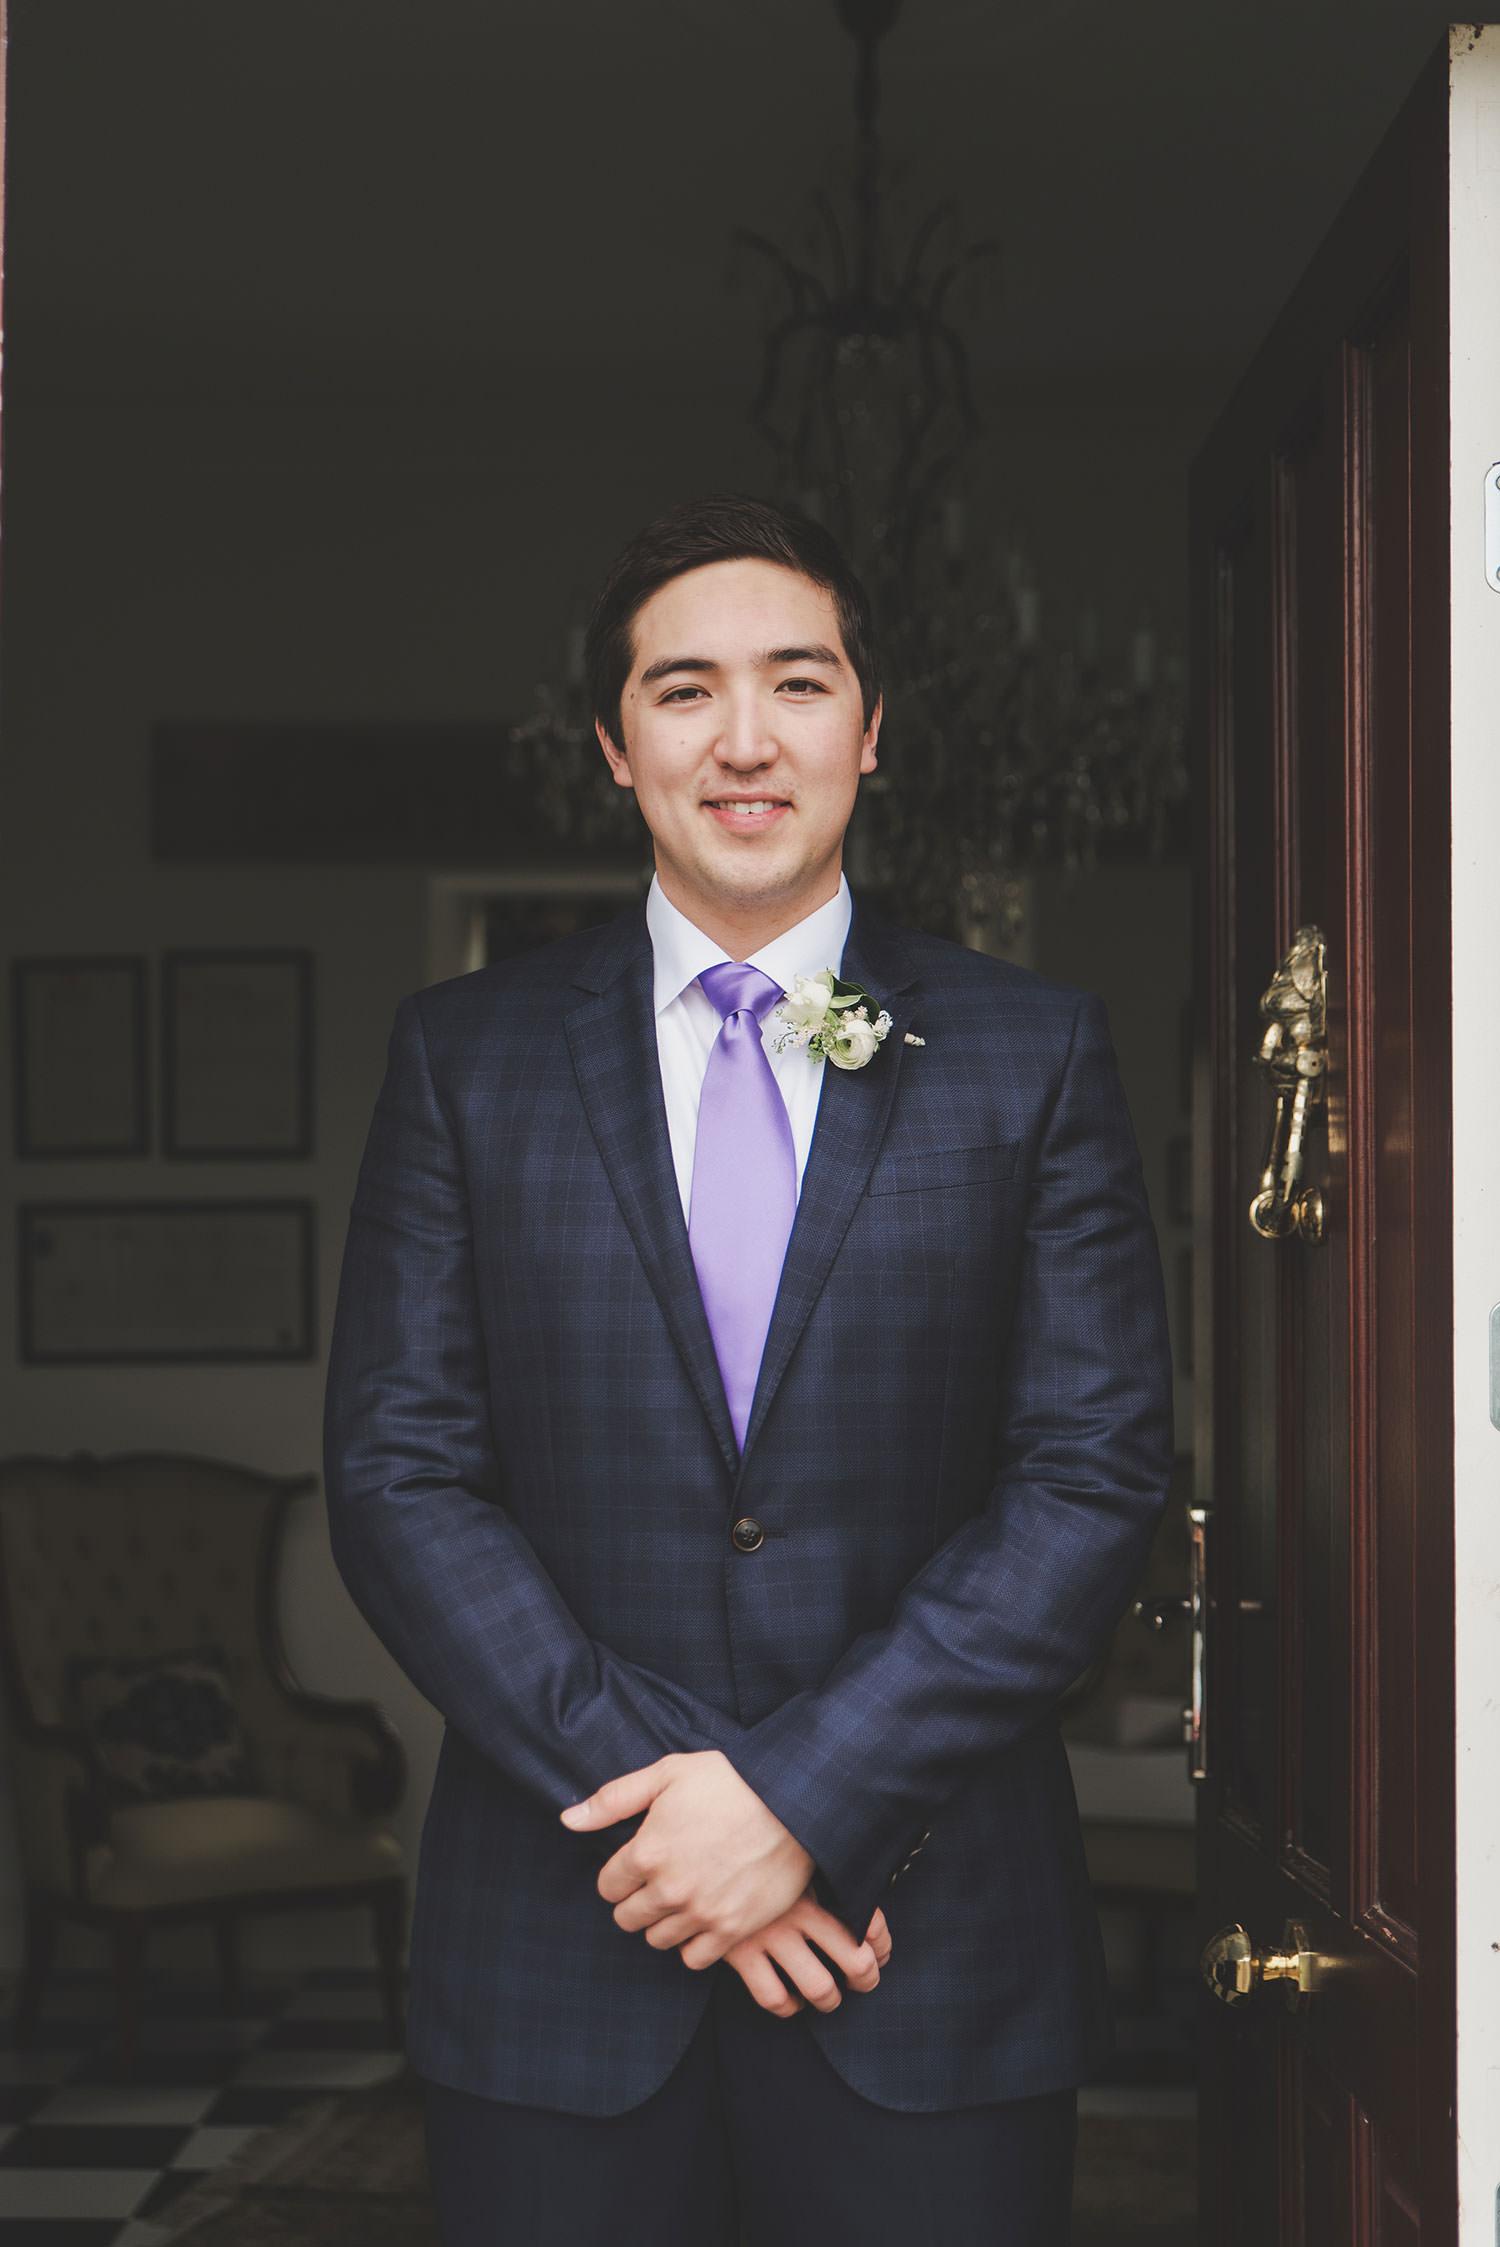 wedding-photography-dublin041.jpg